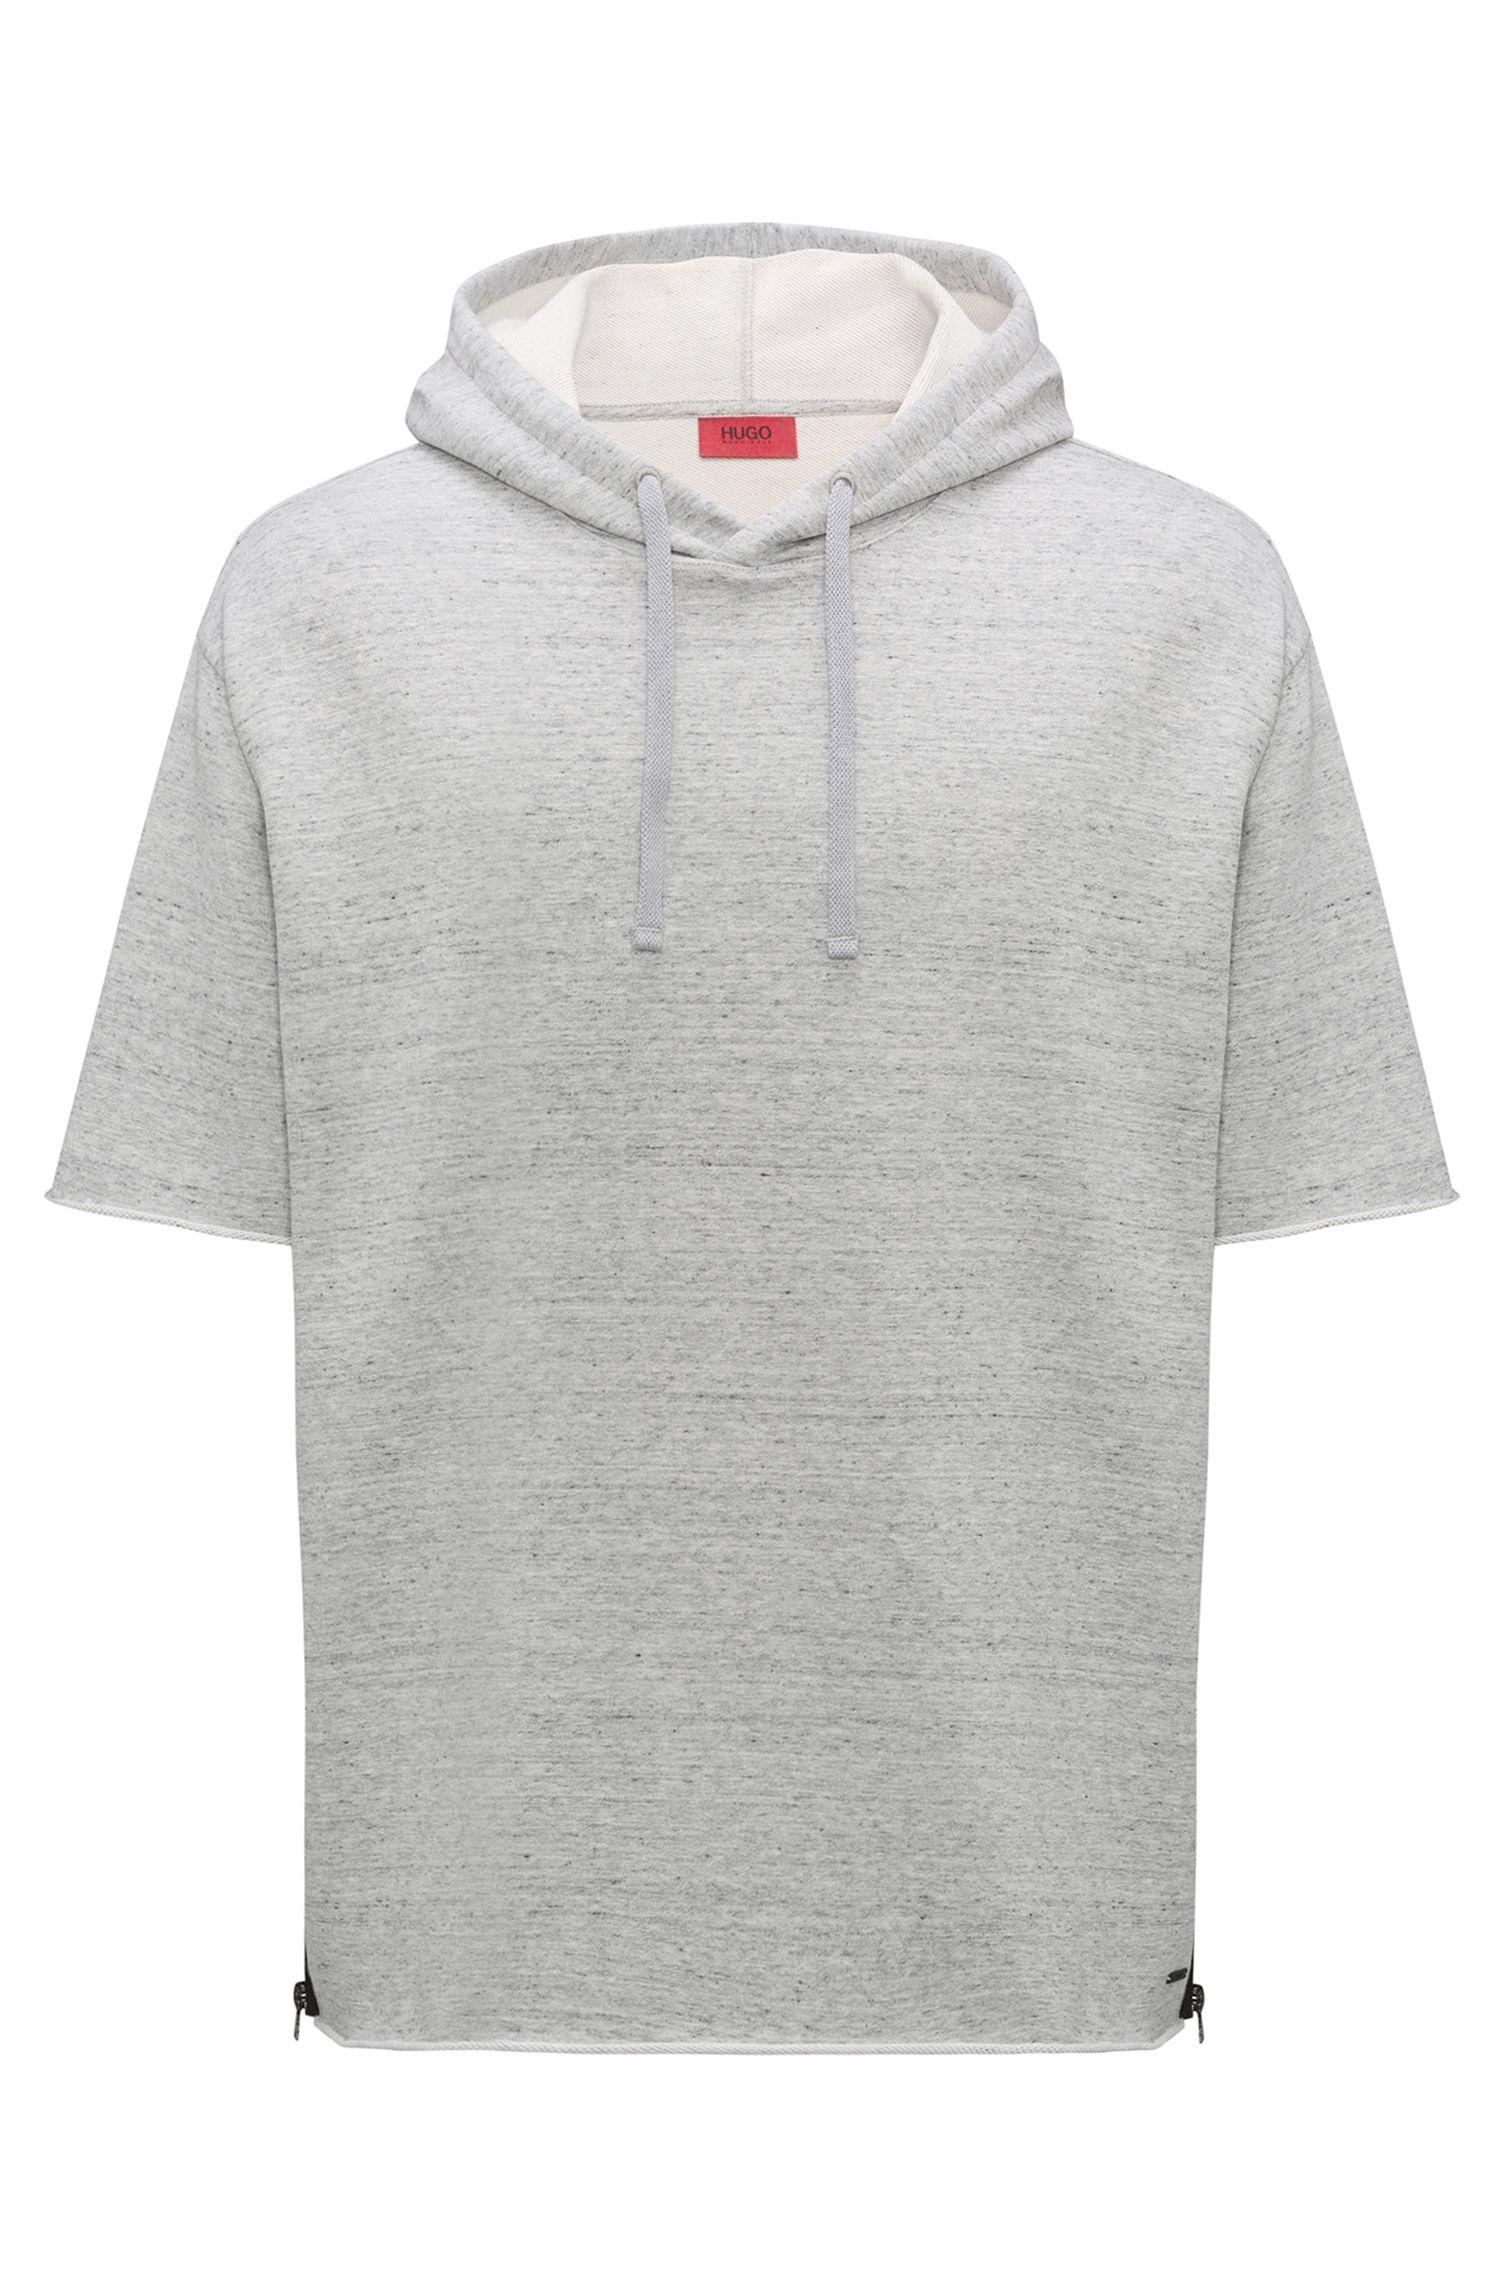 Short-sleeved hooded sweatshirt with zipped side seams